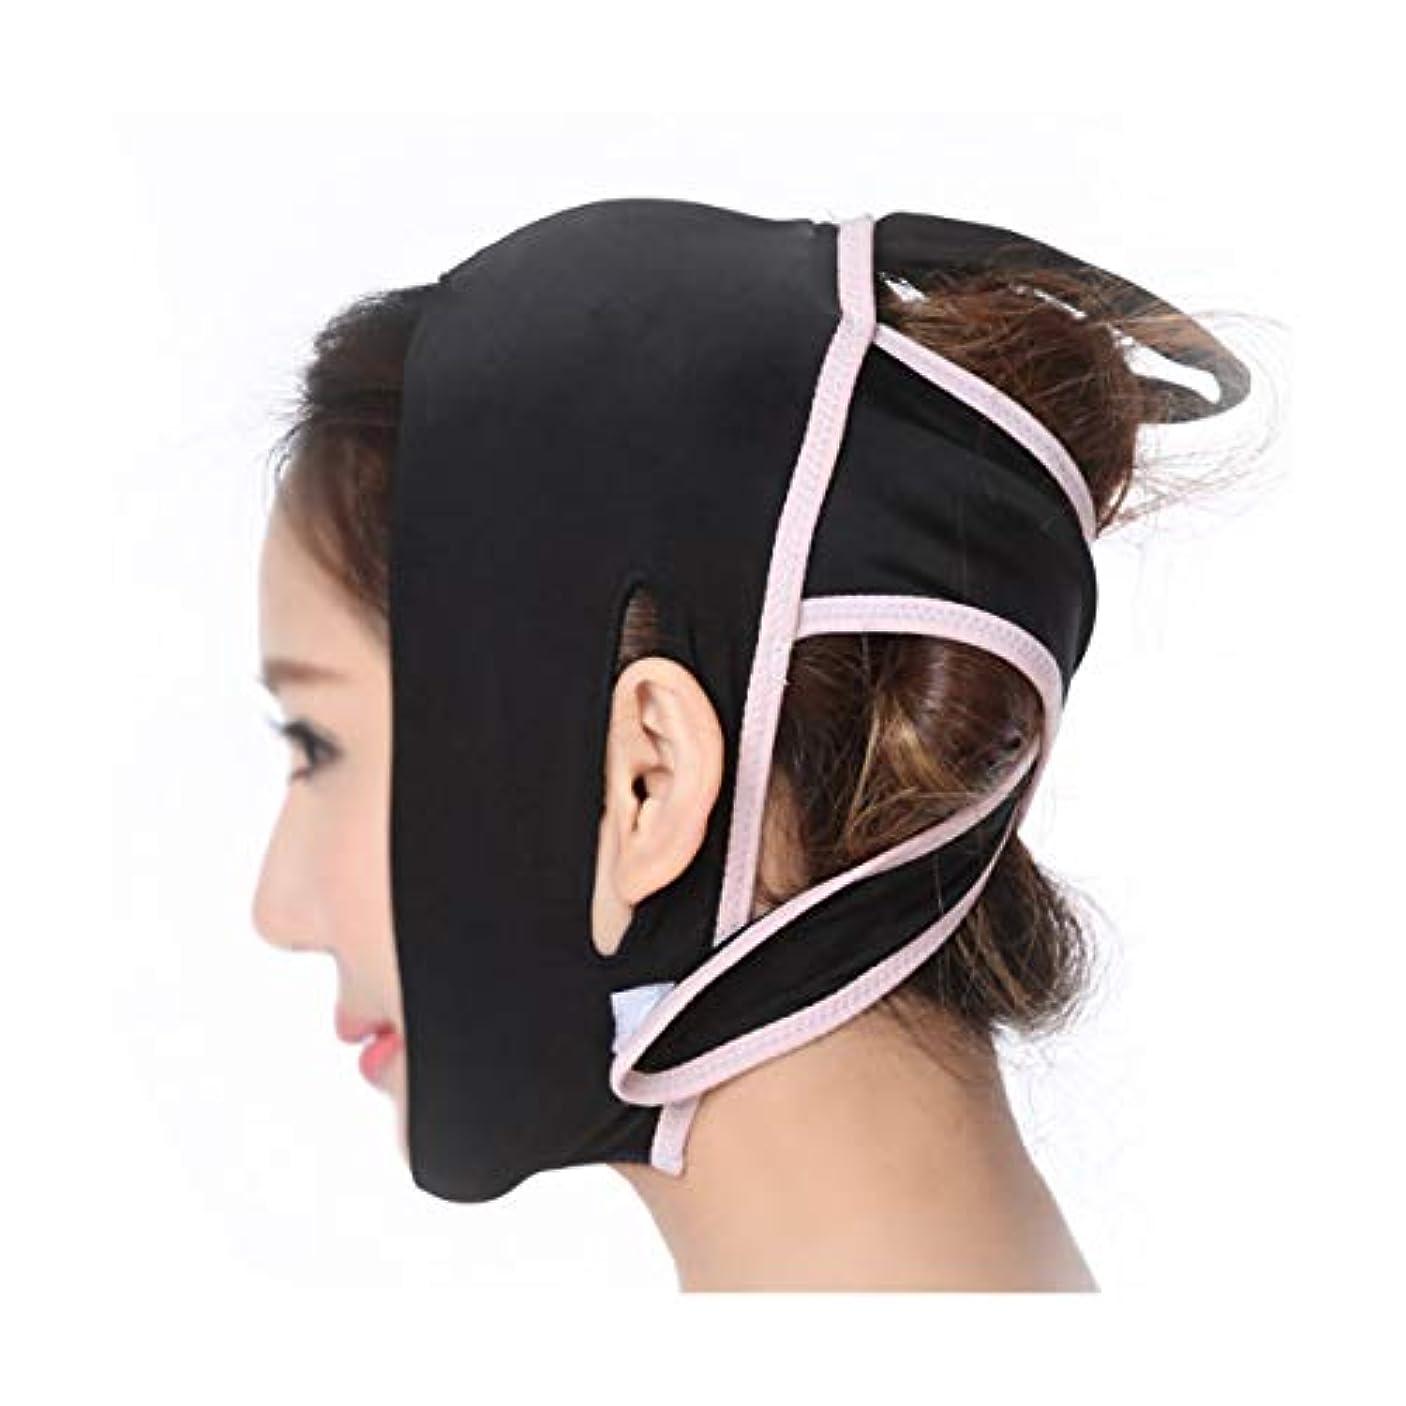 GLJJQMY ファーミングマスク薄い顔薄い顔薄い顔アーティファクト顔薄い顔マスクv顔薄い顔マスク顔薄い顔楽器 顔用整形マスク (Size : S)